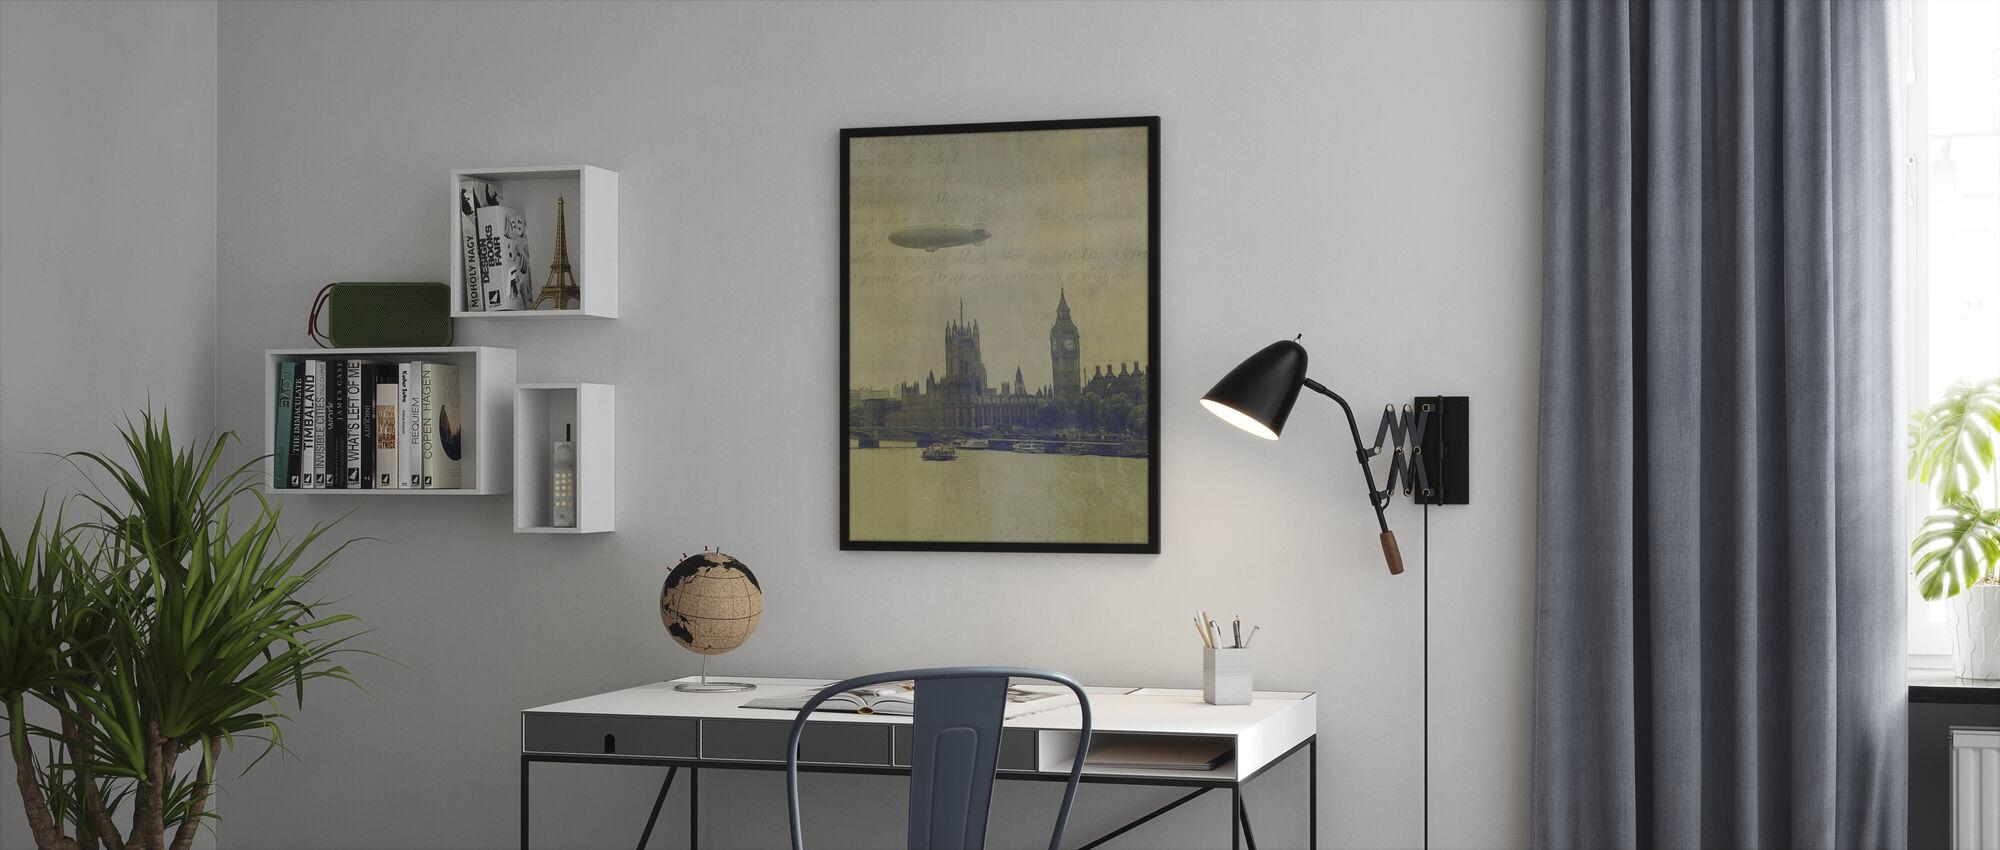 Travel Aviation l - Framed print - Office